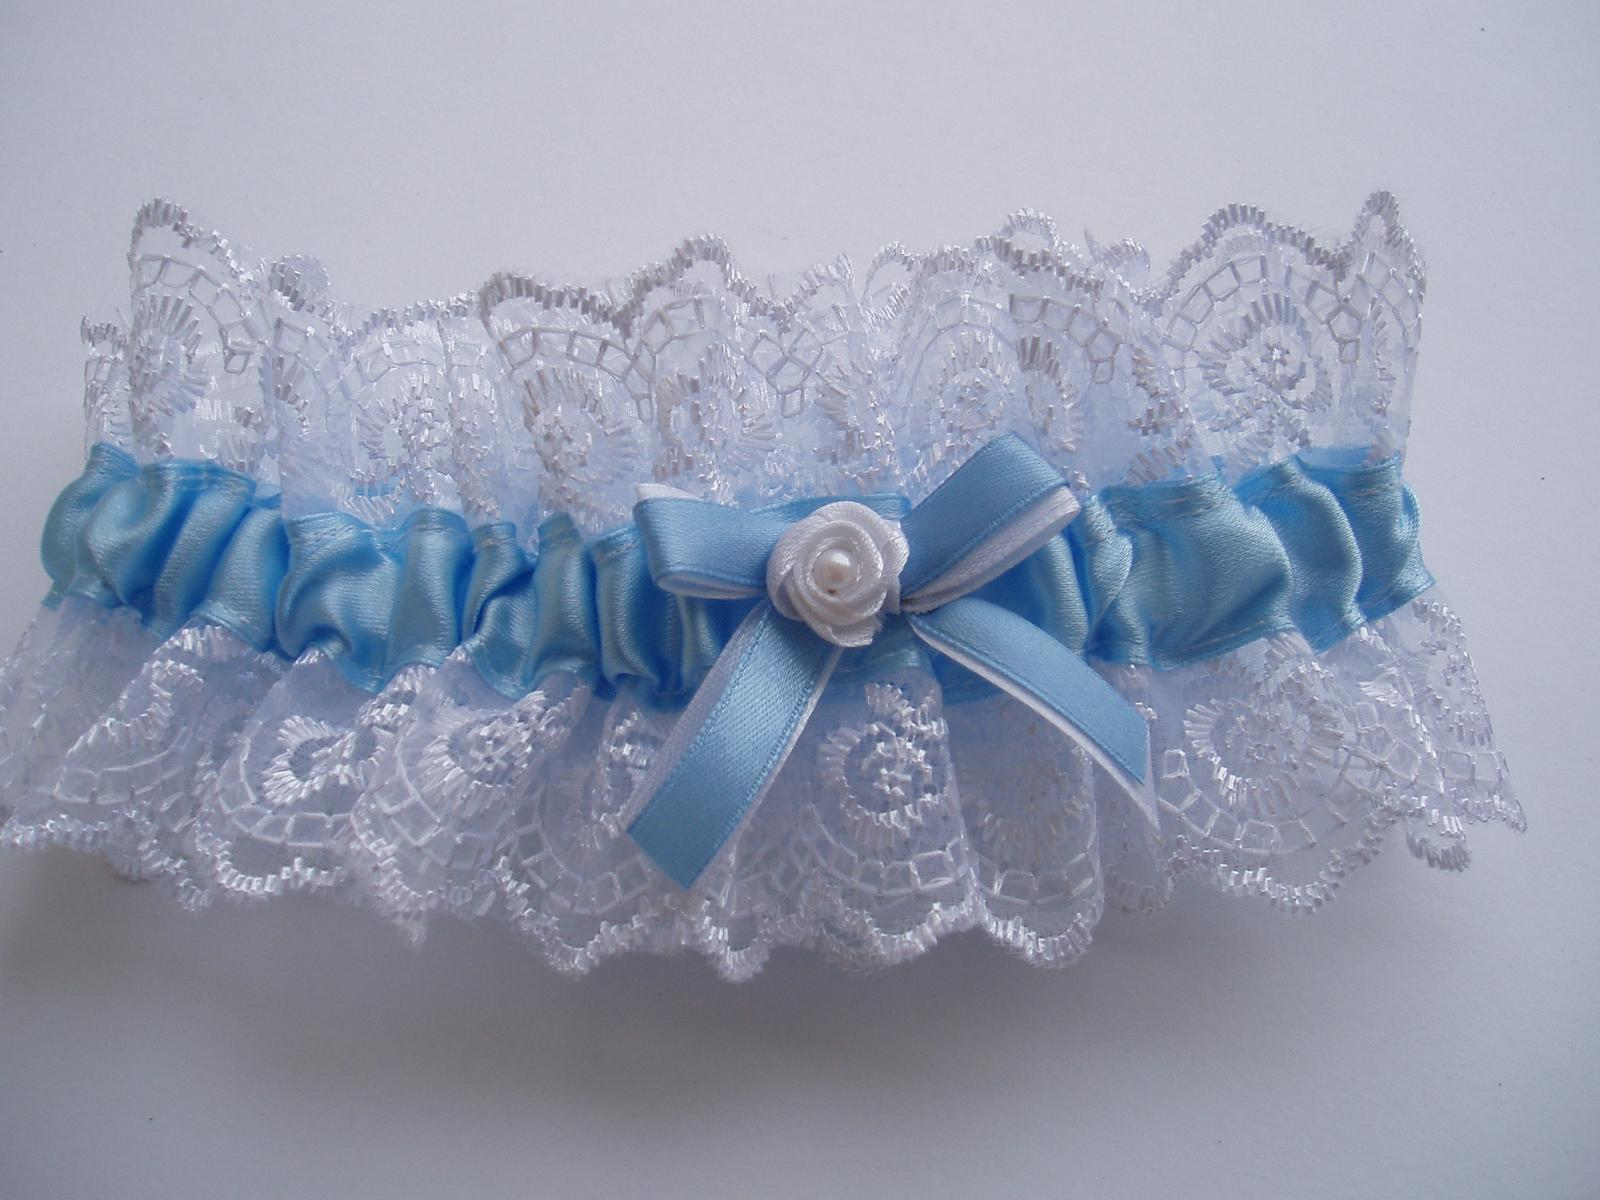 modro-bílý podvazek - Obrázek č. 1